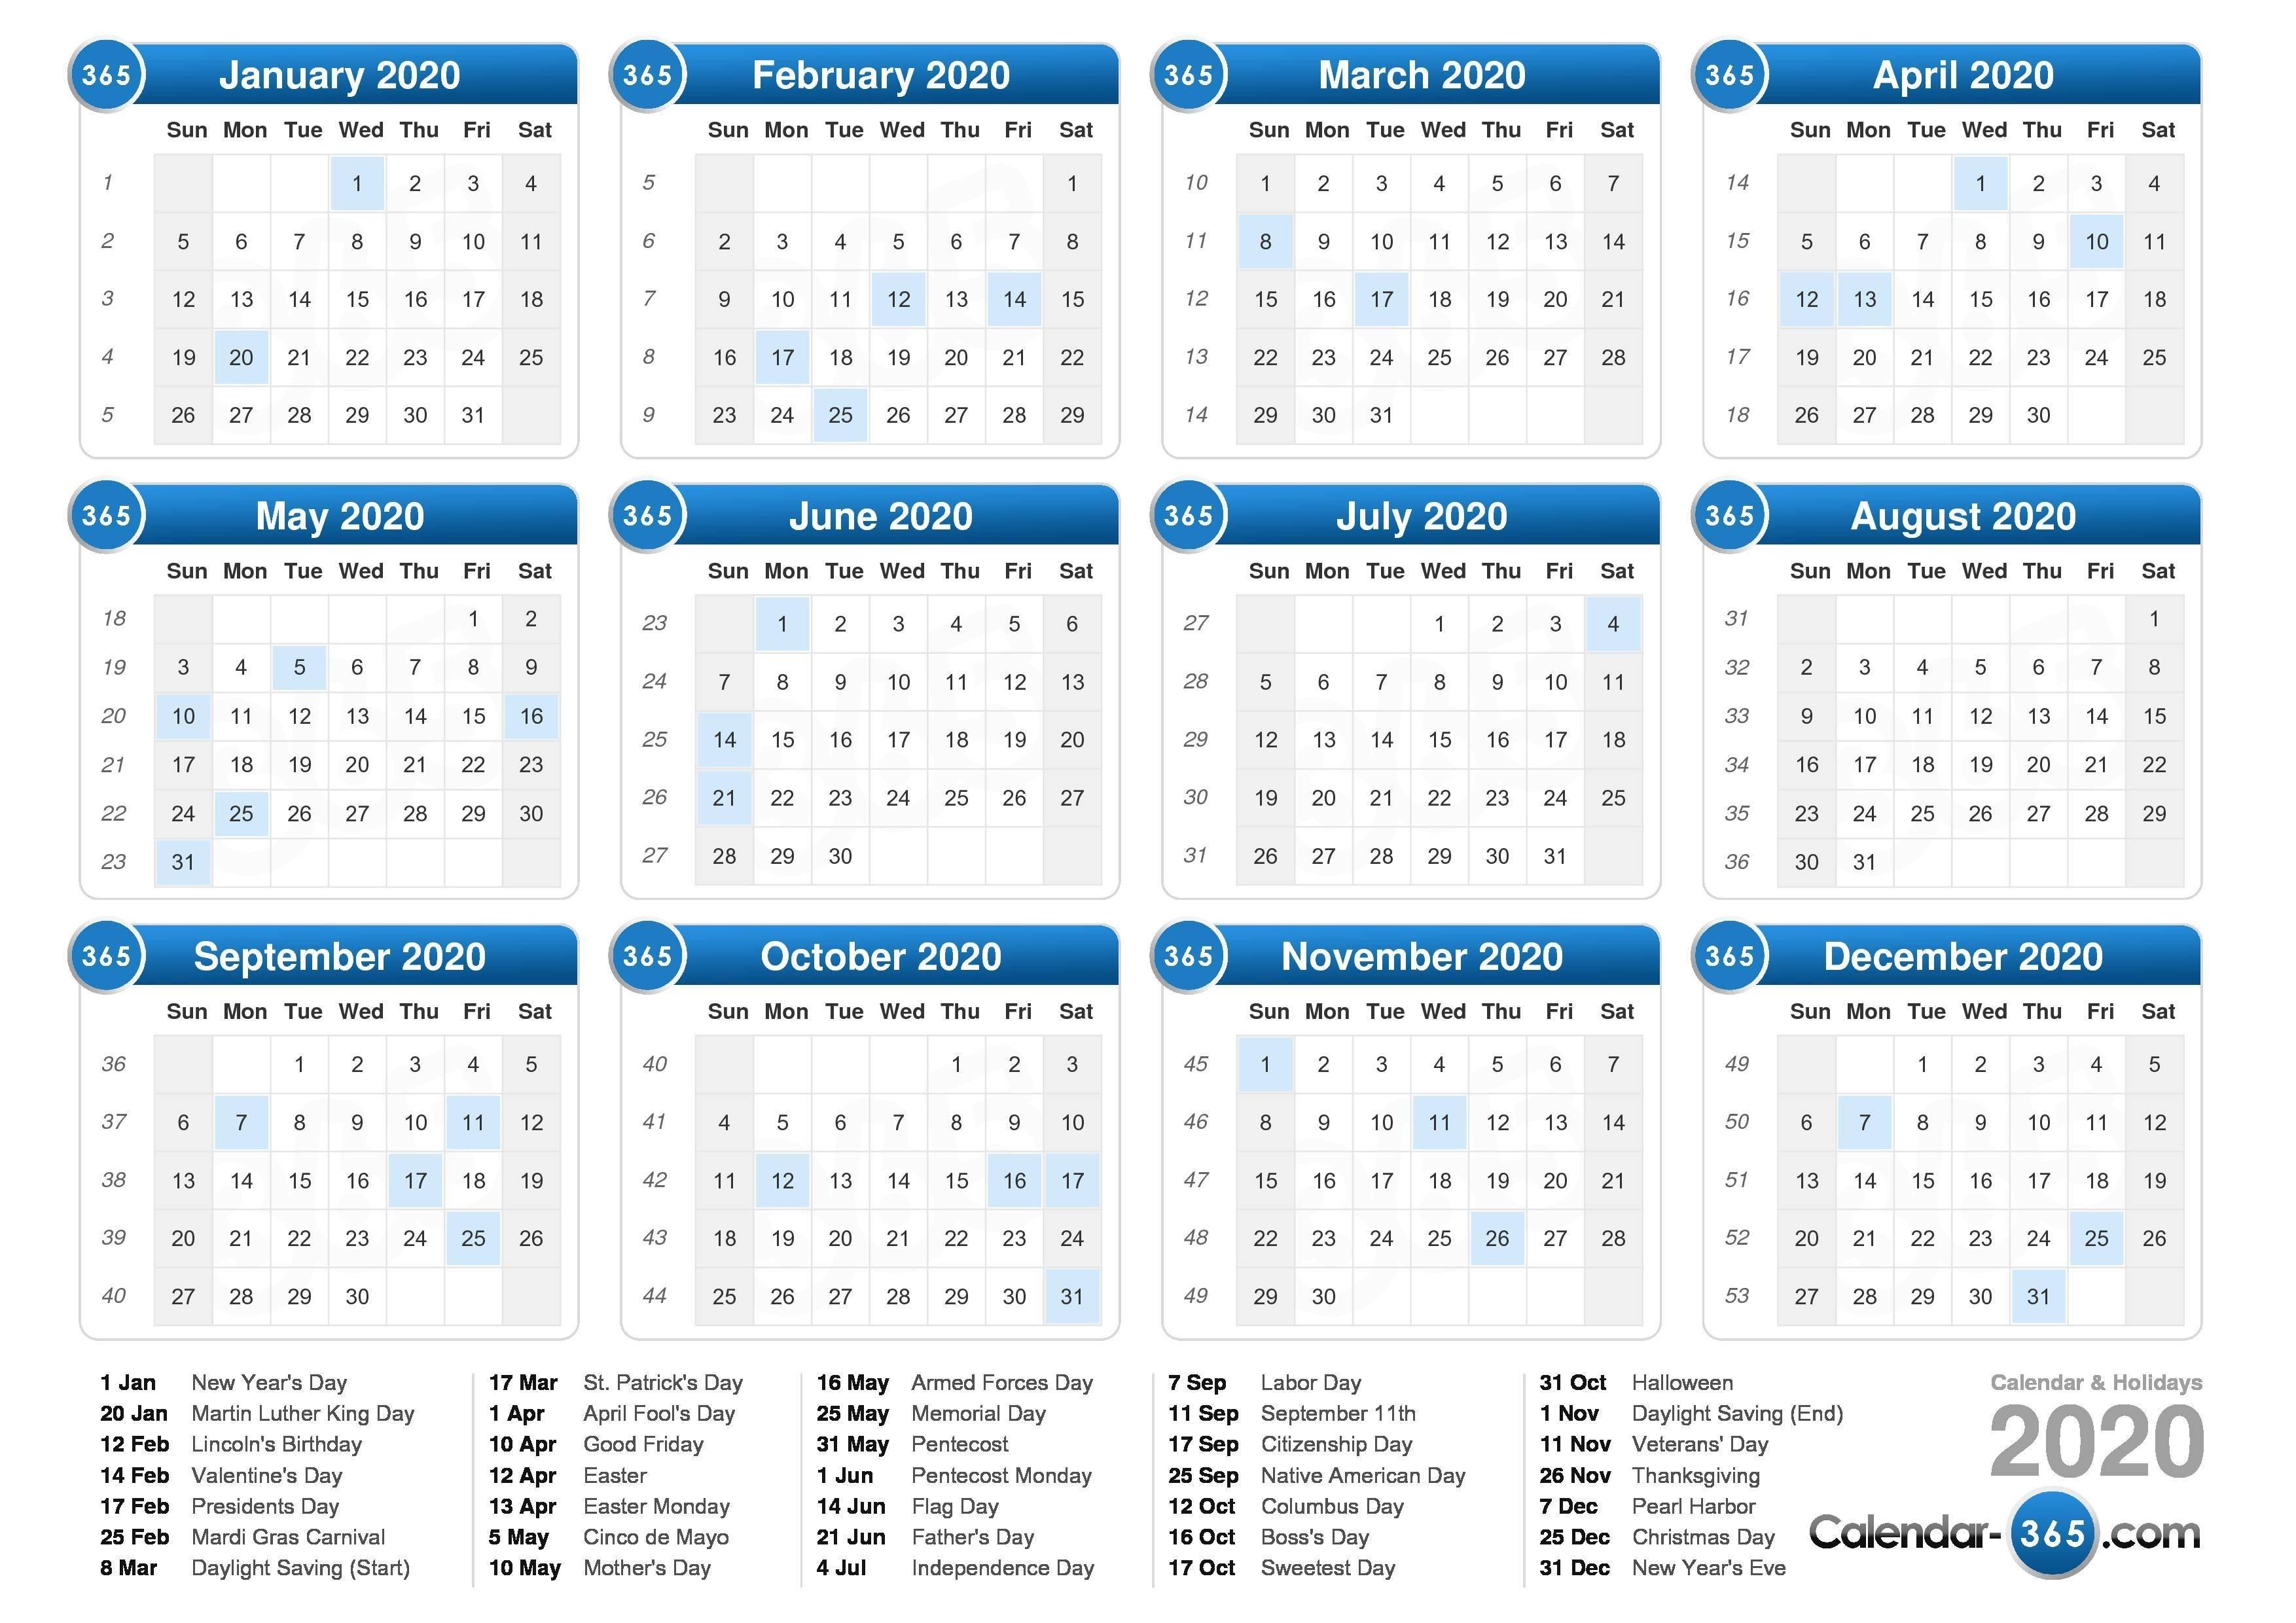 2020 Calendar-Calendar For 2020 Printable With Legal Holidays